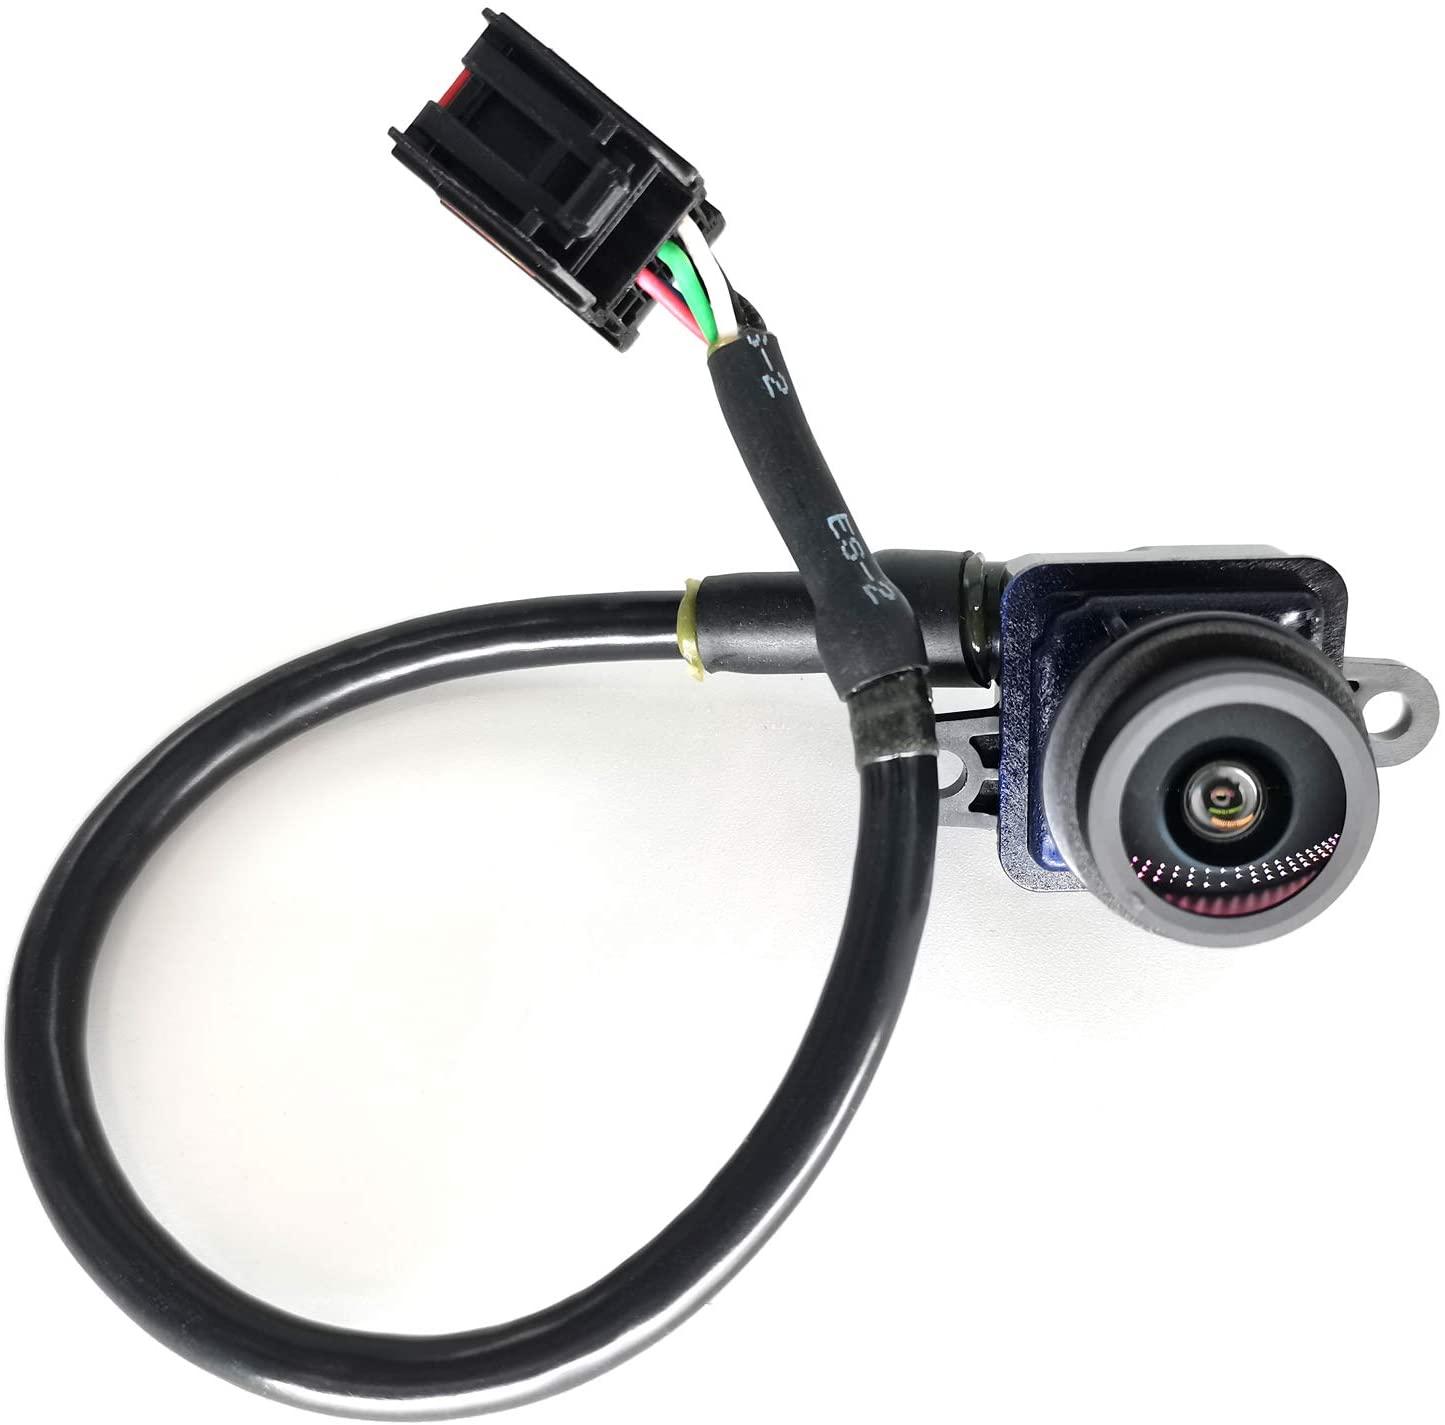 Rear View Backup Camera For Dodge Chrysler 300 2011-2018 Charger 2011-2014 56054058AH Black